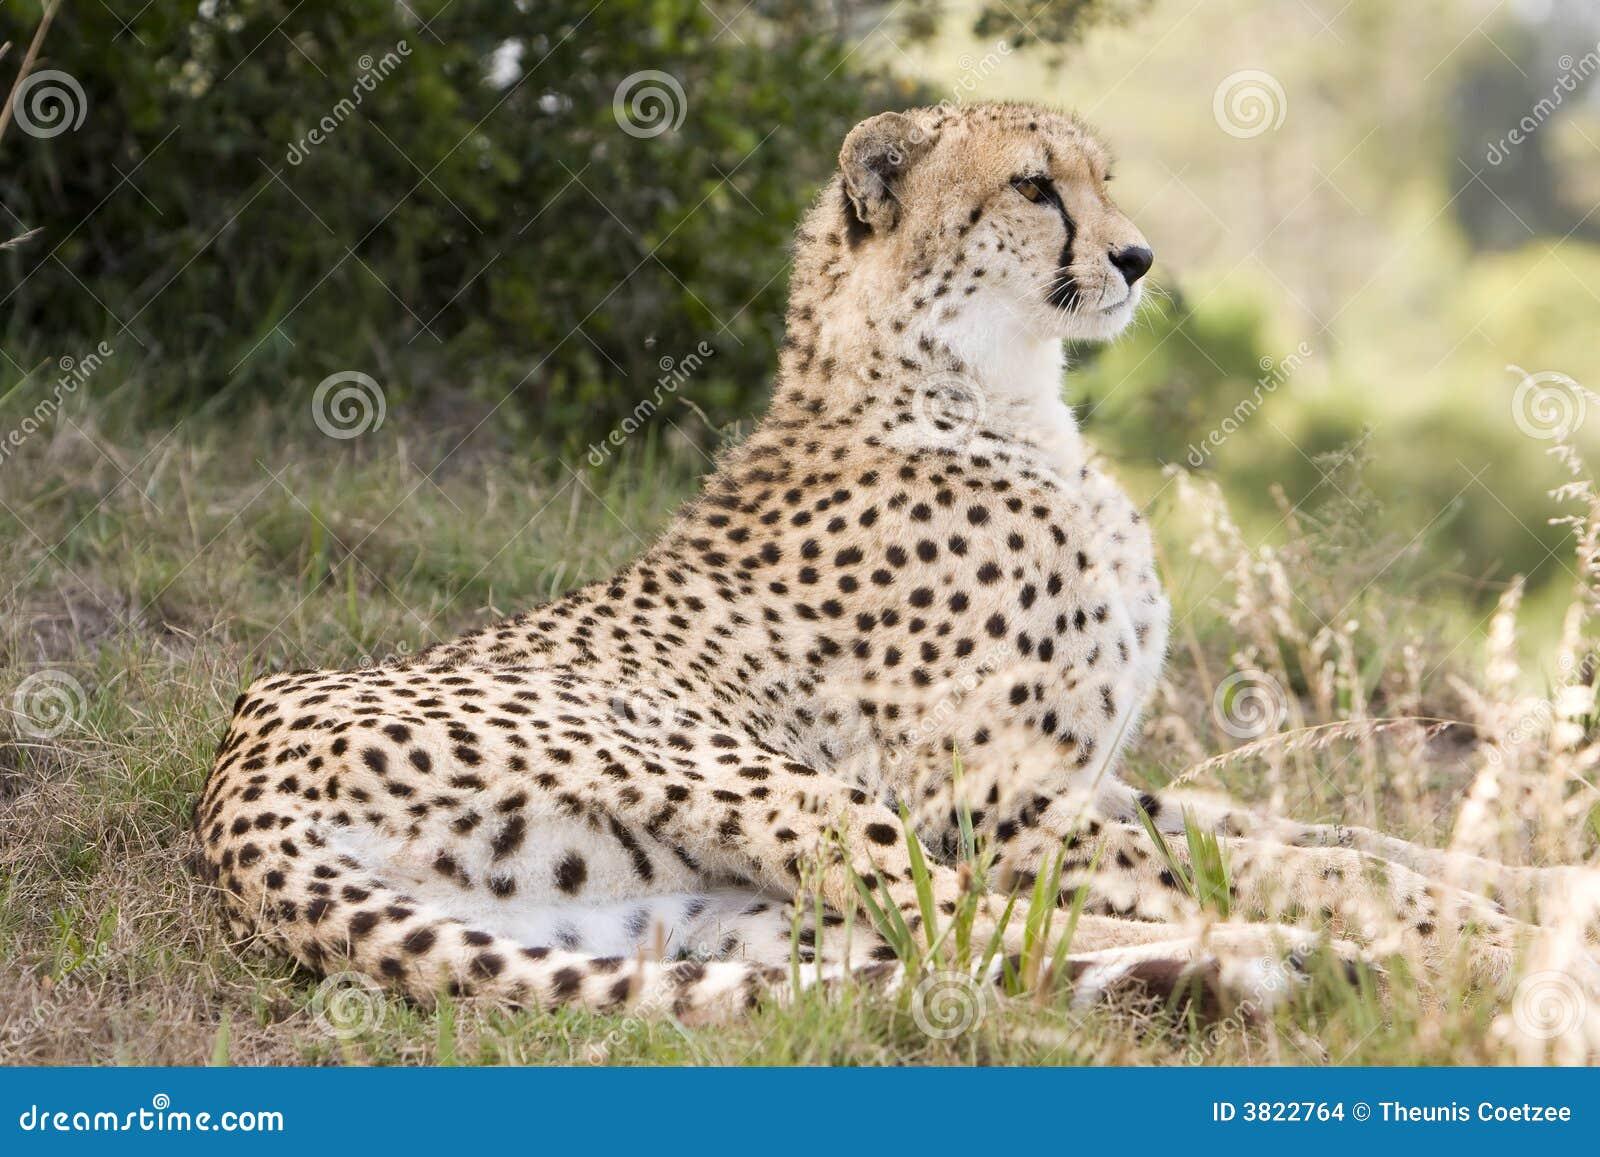 Cheetah sitting down drawing - photo#6